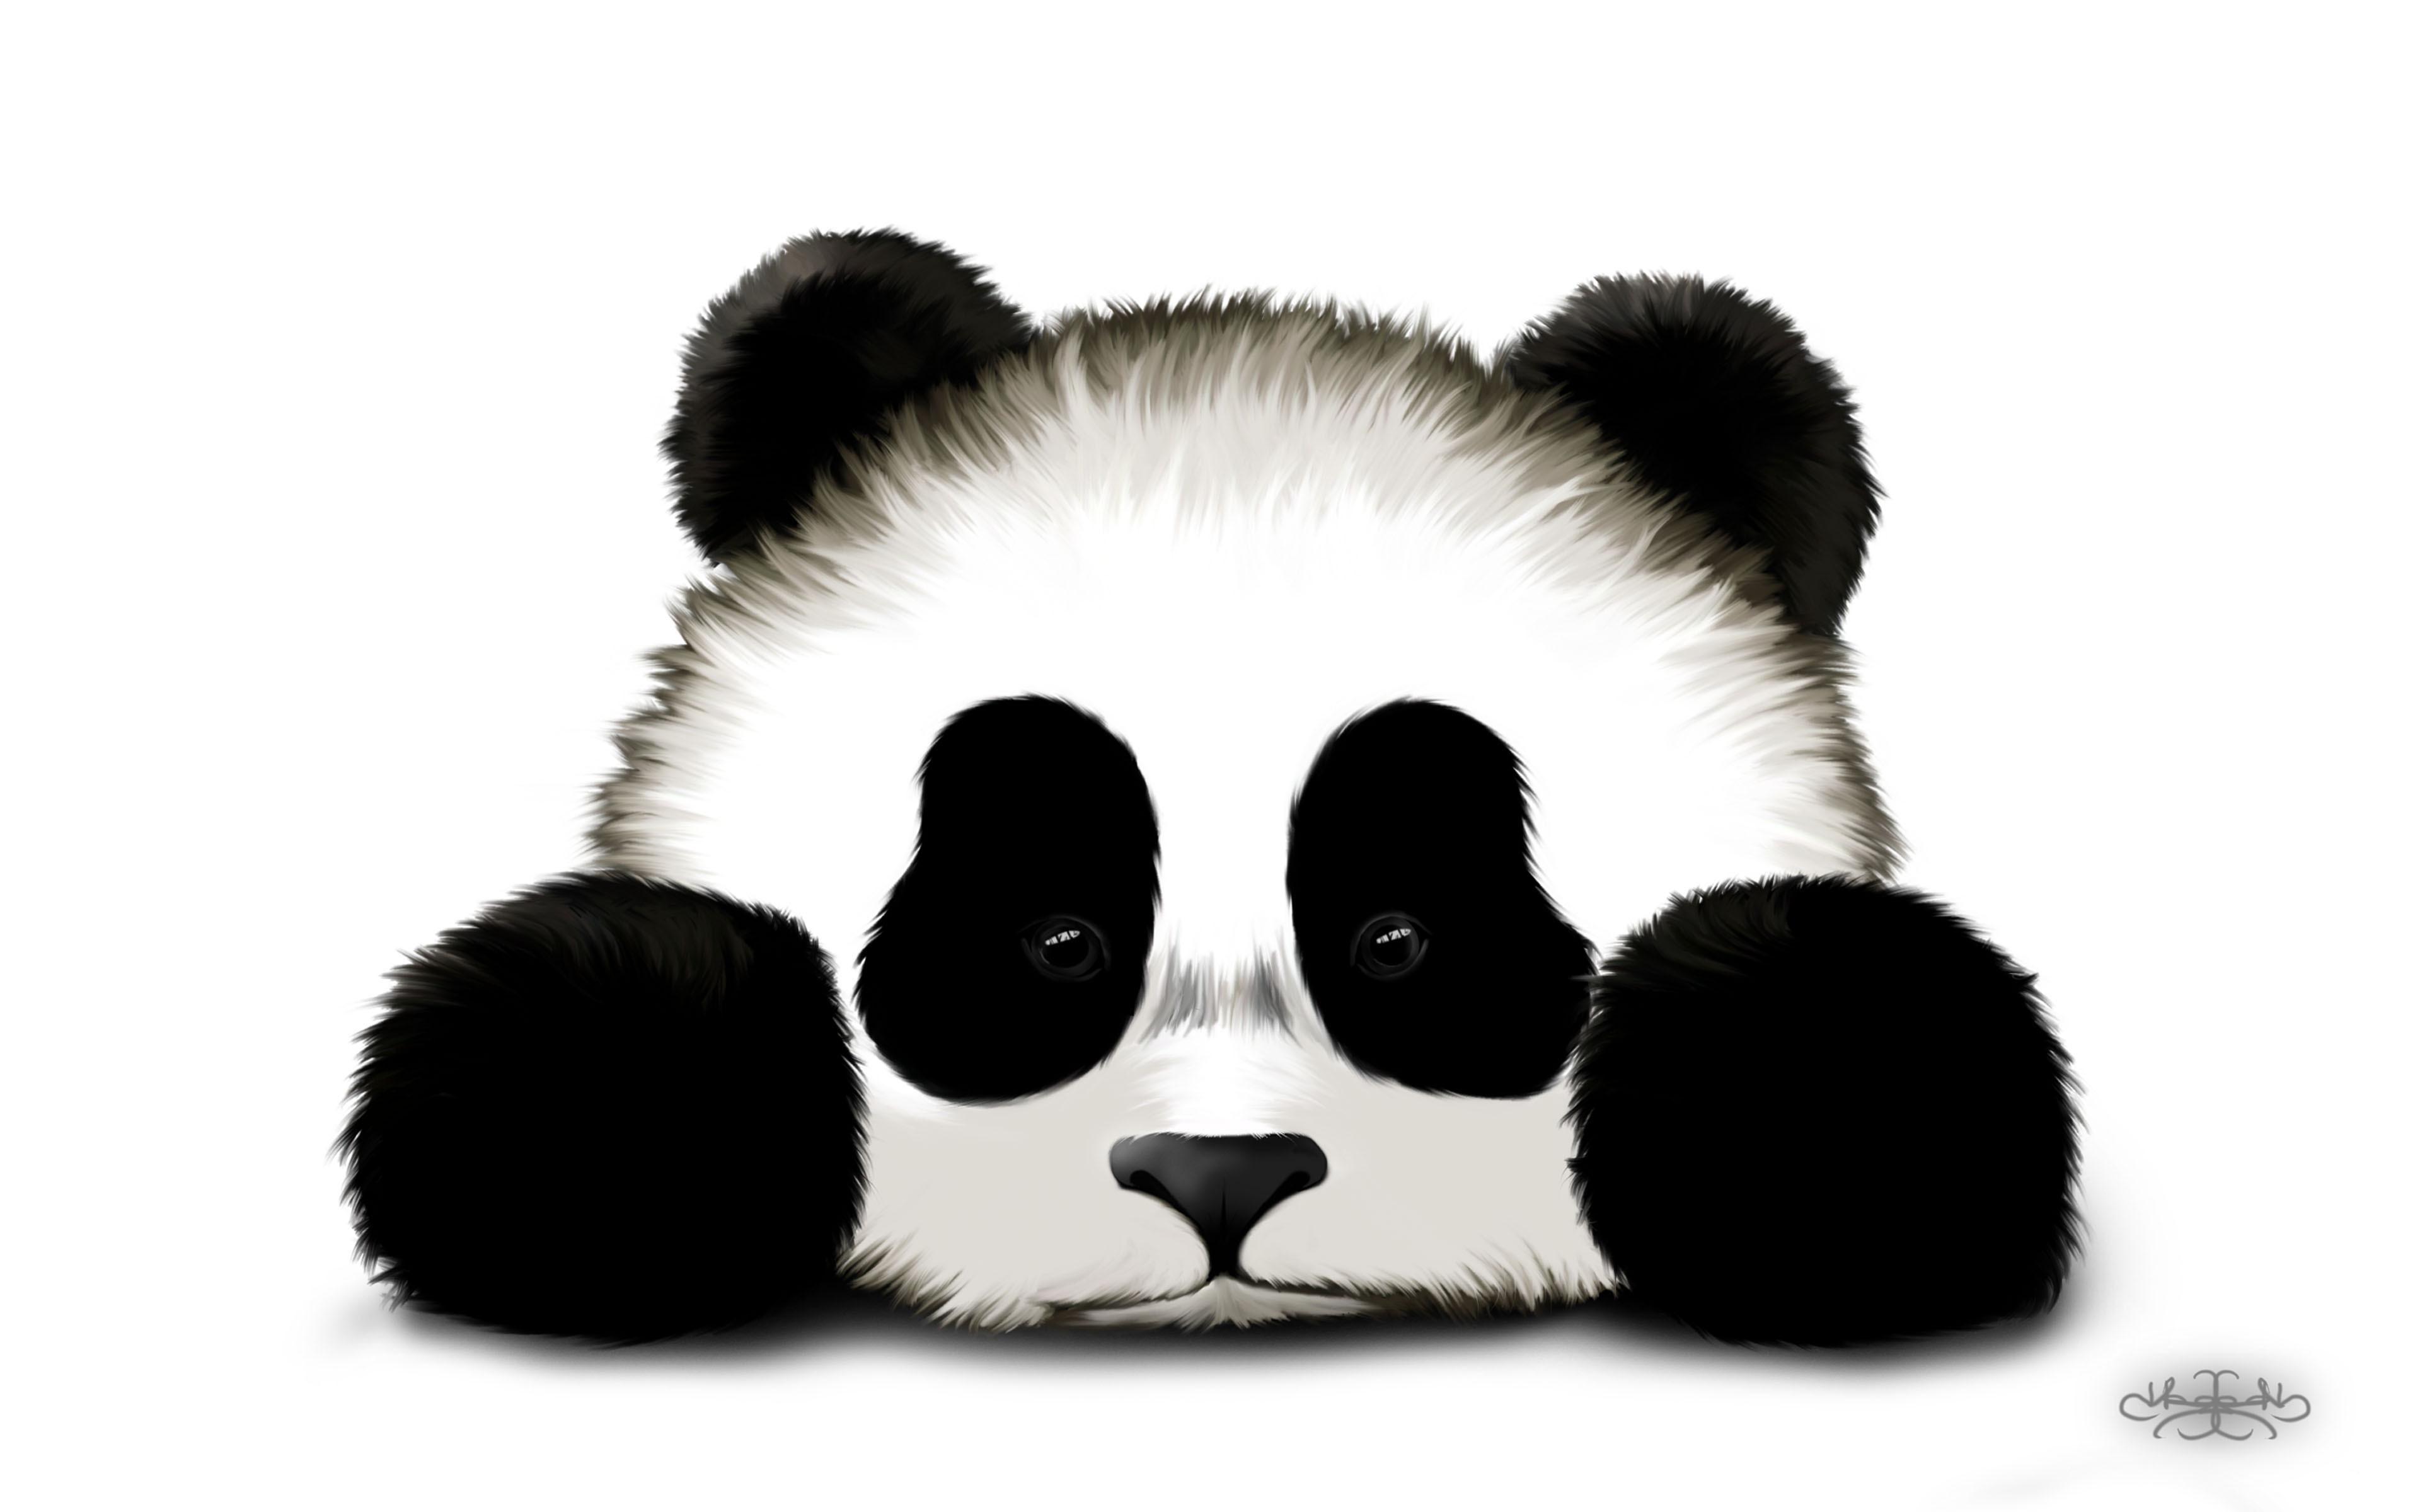 Ehentai wow panda gif nackt download